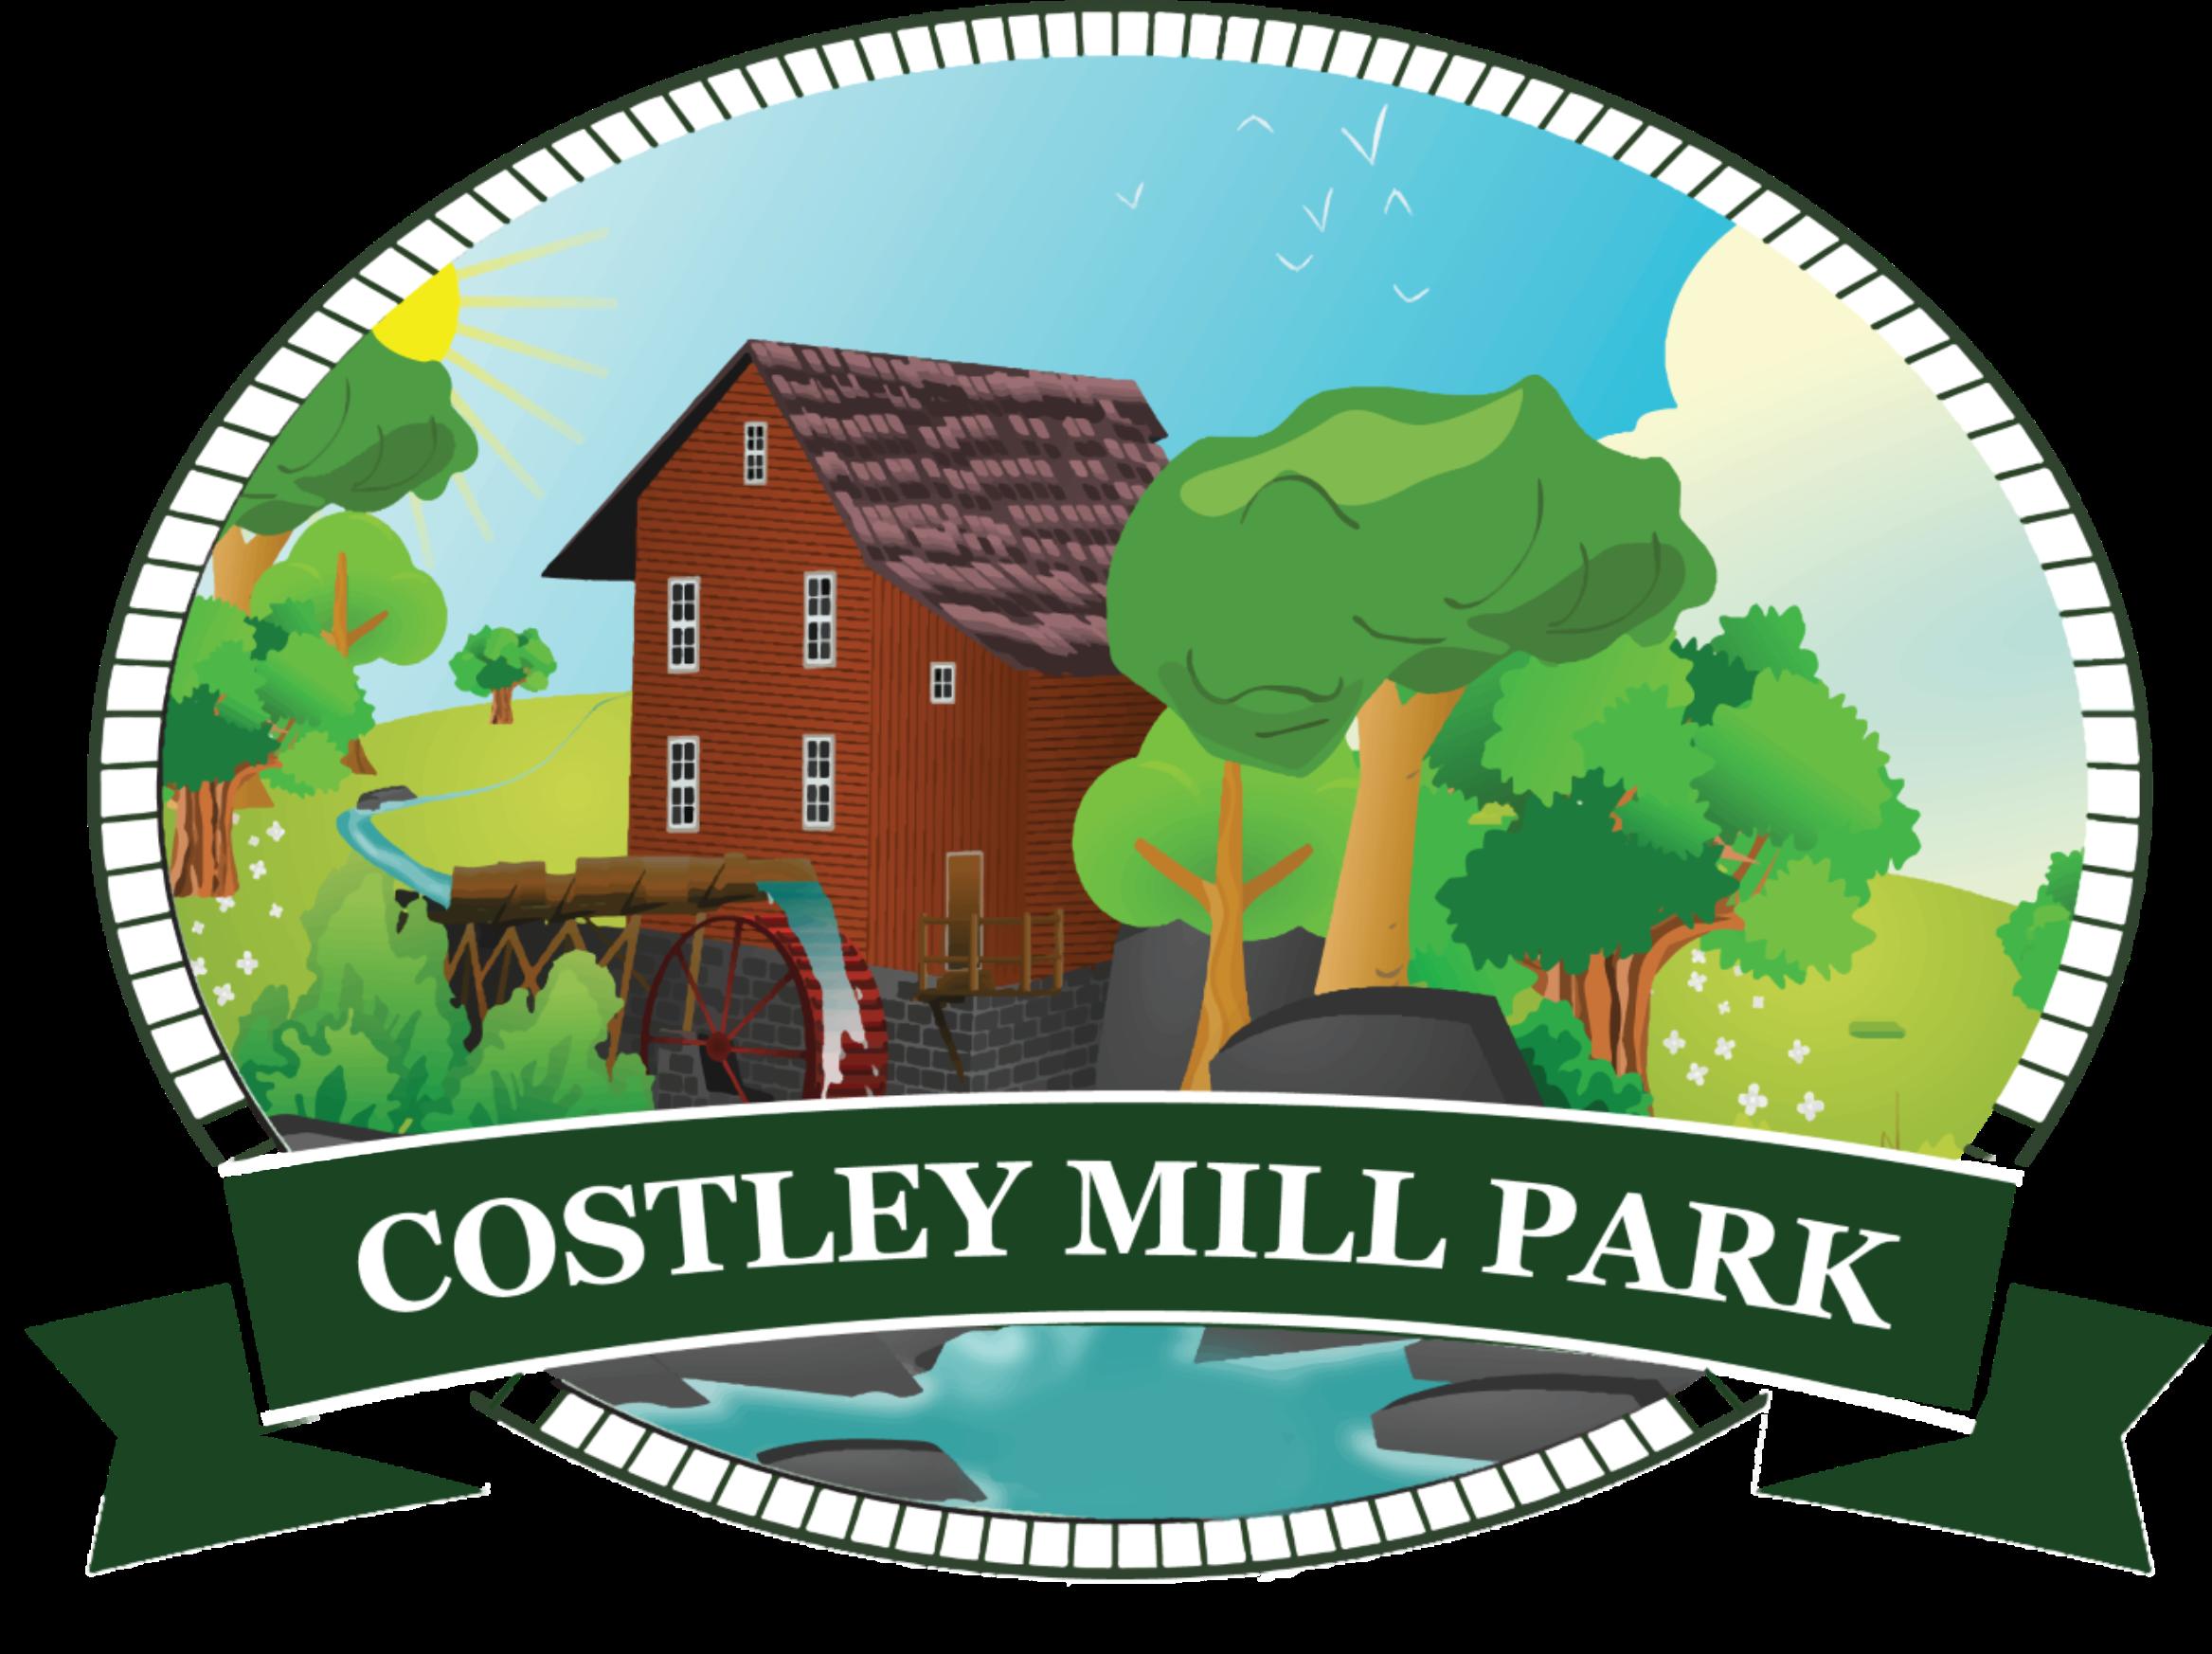 Costley Mill Park